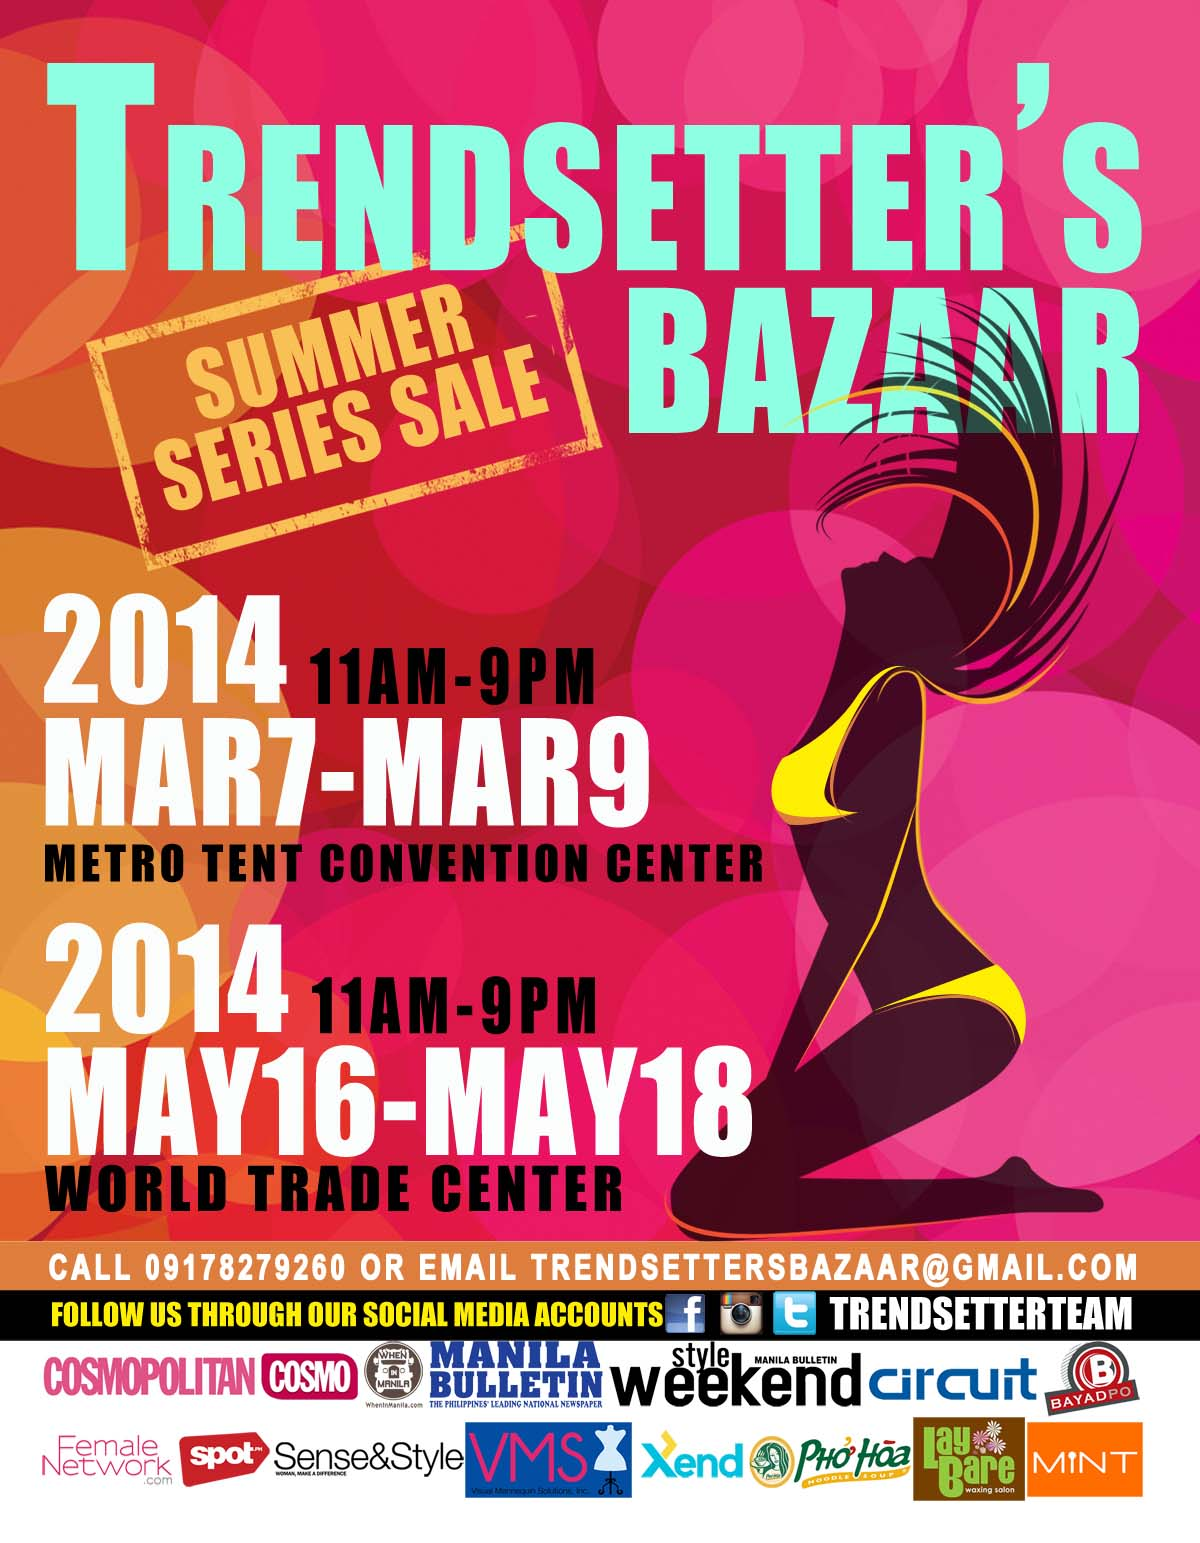 Trendsetter Bazaar @ Metro Tent Convention Center March 2014